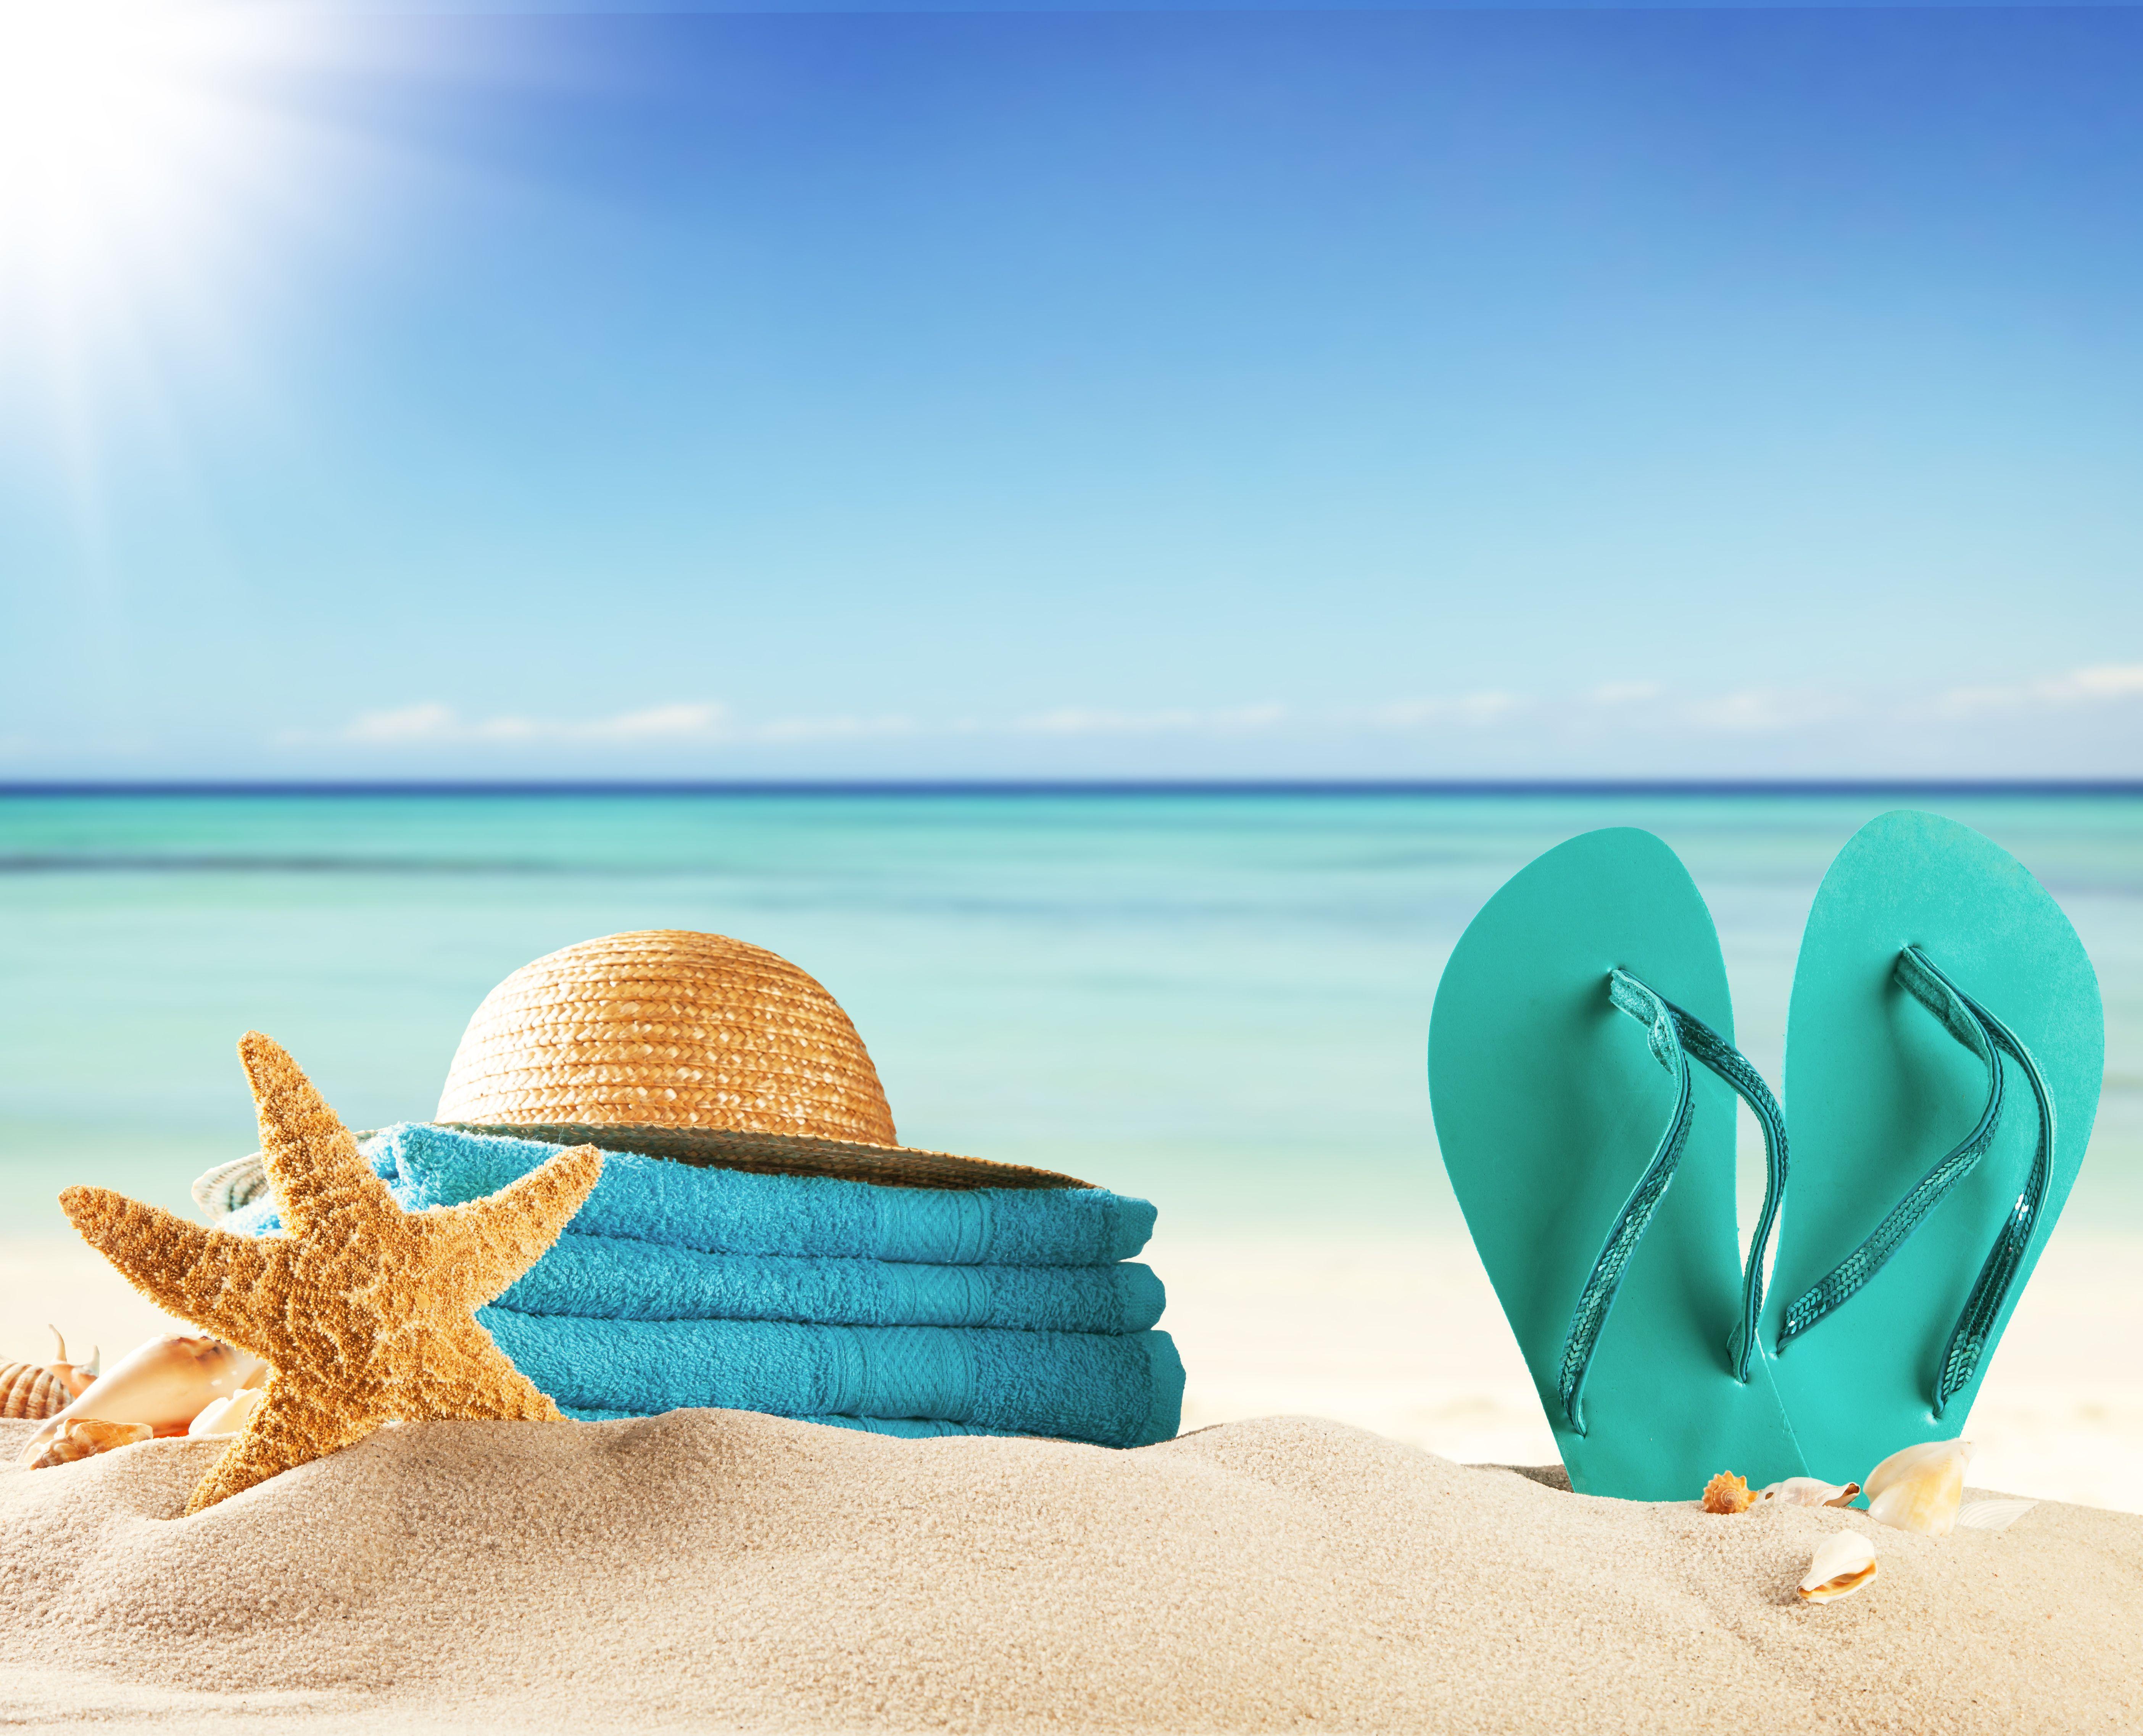 8beb33778510 Enjoy summer holidays 2016 hat flower starfish cocktail